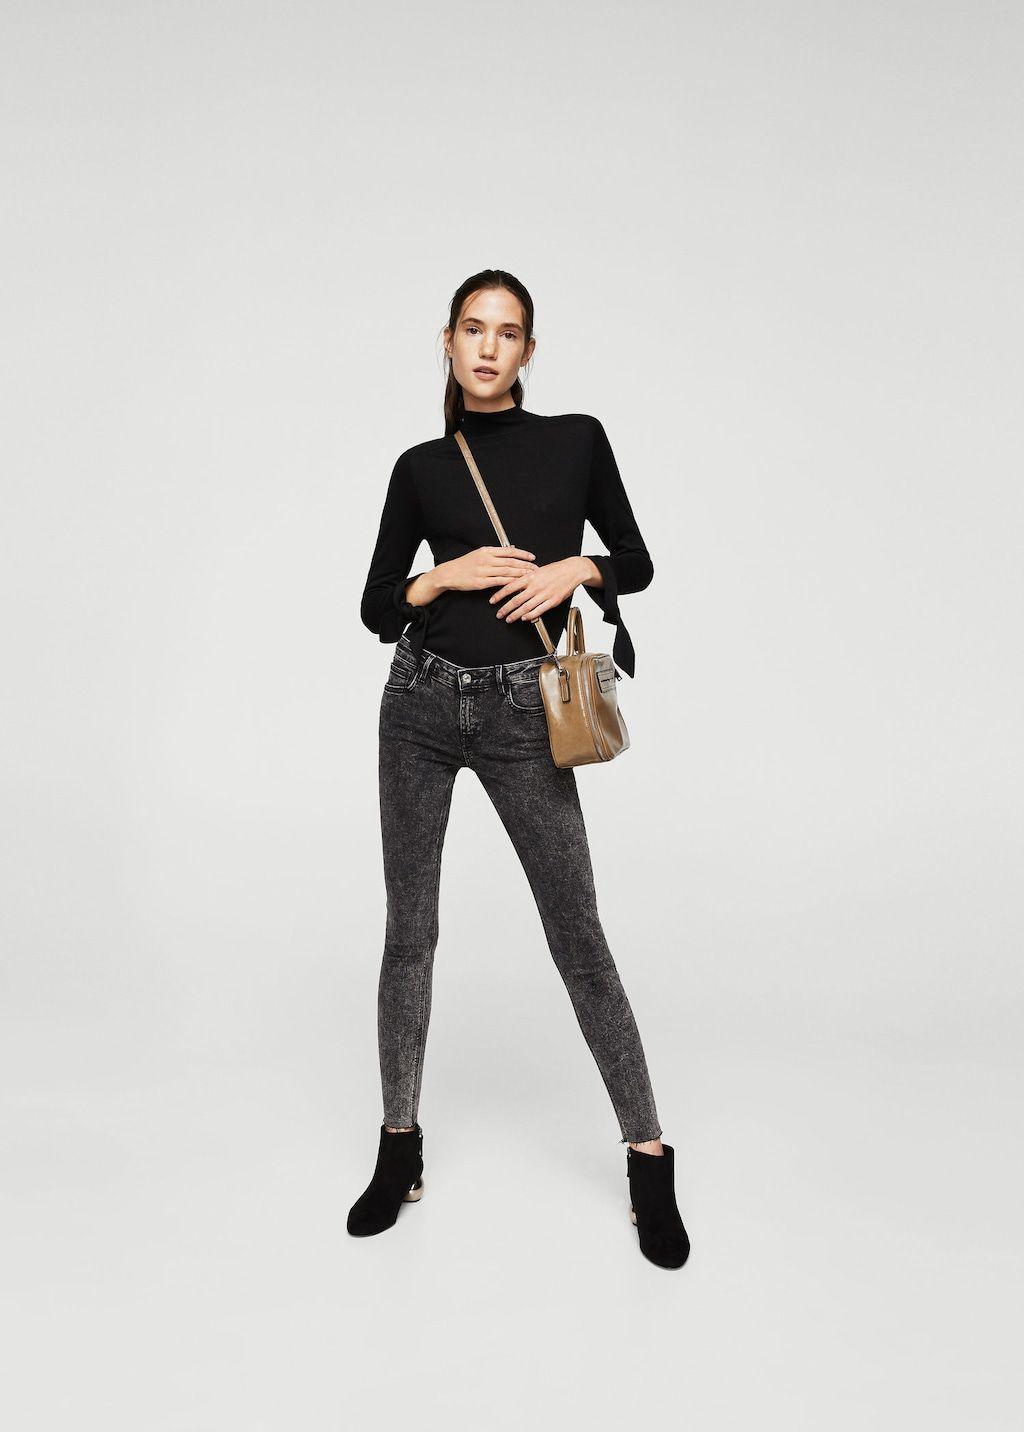 Kim Blue Skinny Pinterest Jeans N WomenBlack Push Up SpzMVU